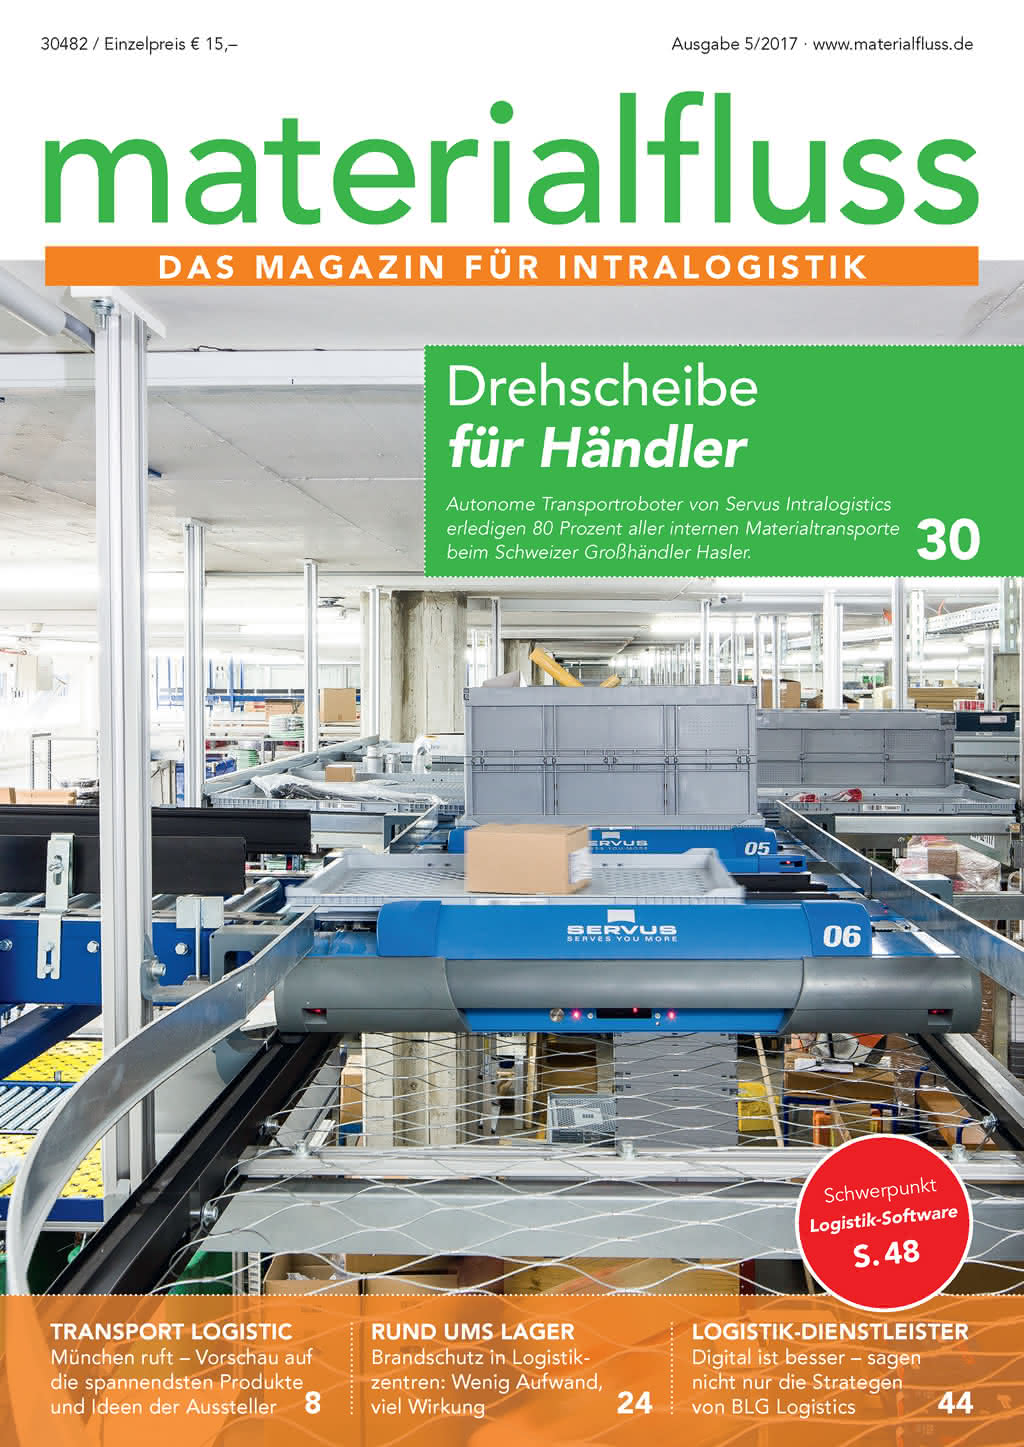 Materialfluss Titelseite Ausgabe 05/2017